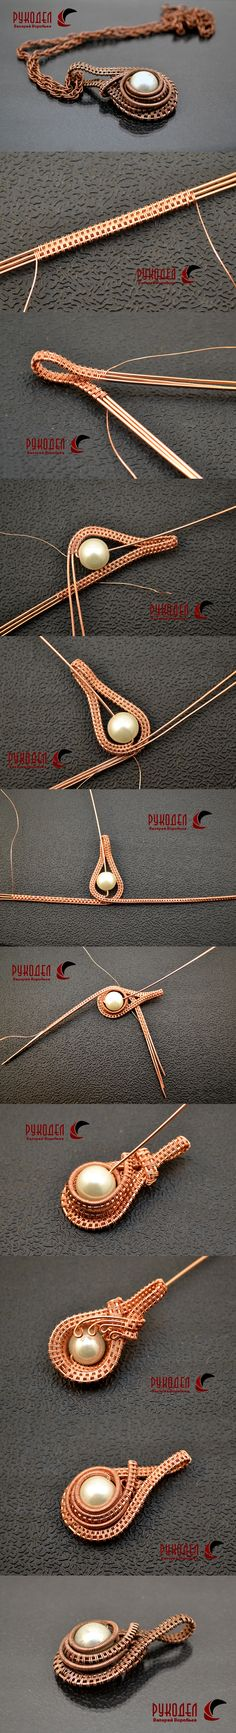 Wire Wrap Pendant. Подвеска из проволоки с бусиной в технике Wire wrap. | Рукодел - http://magazin-rukodel.ru/